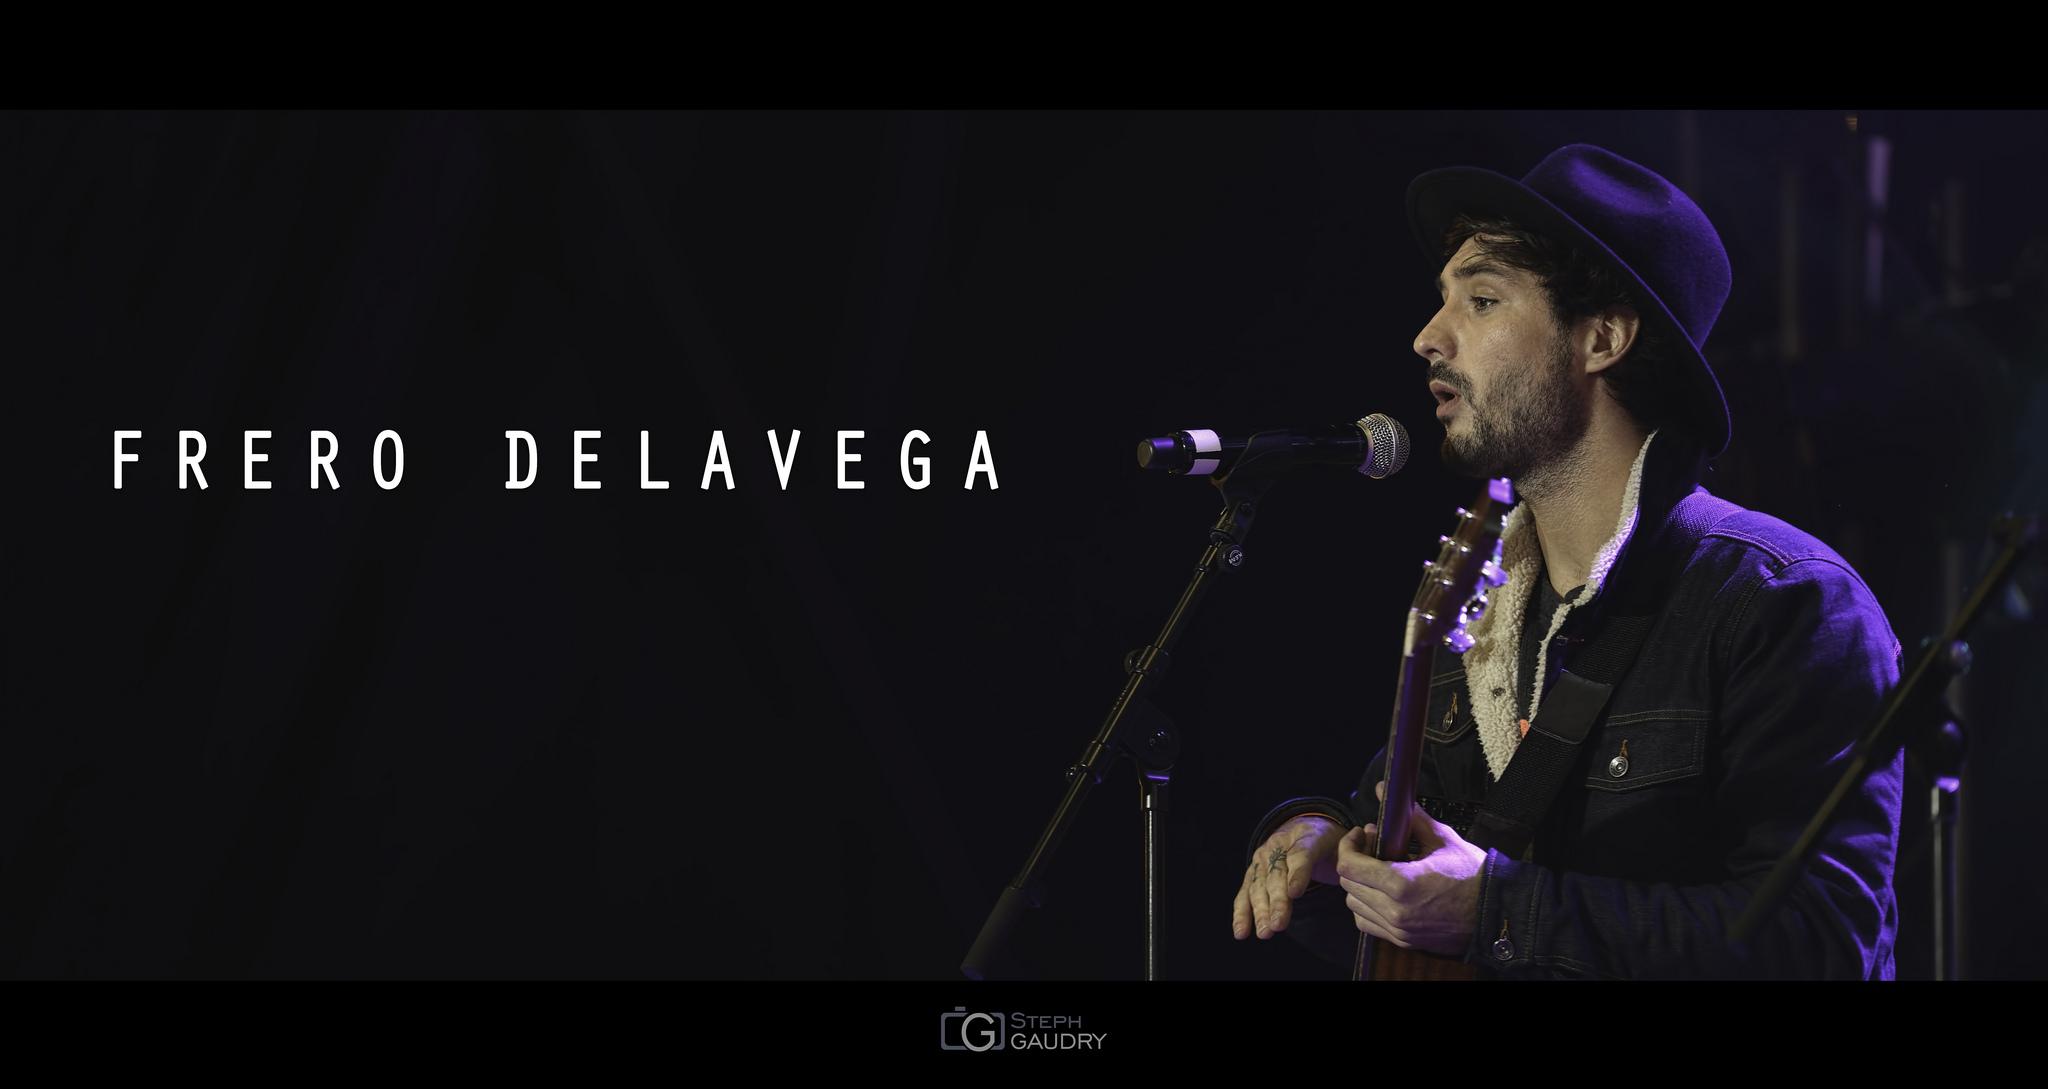 Frero Delavega [Cliquez pour lancer le diaporama]